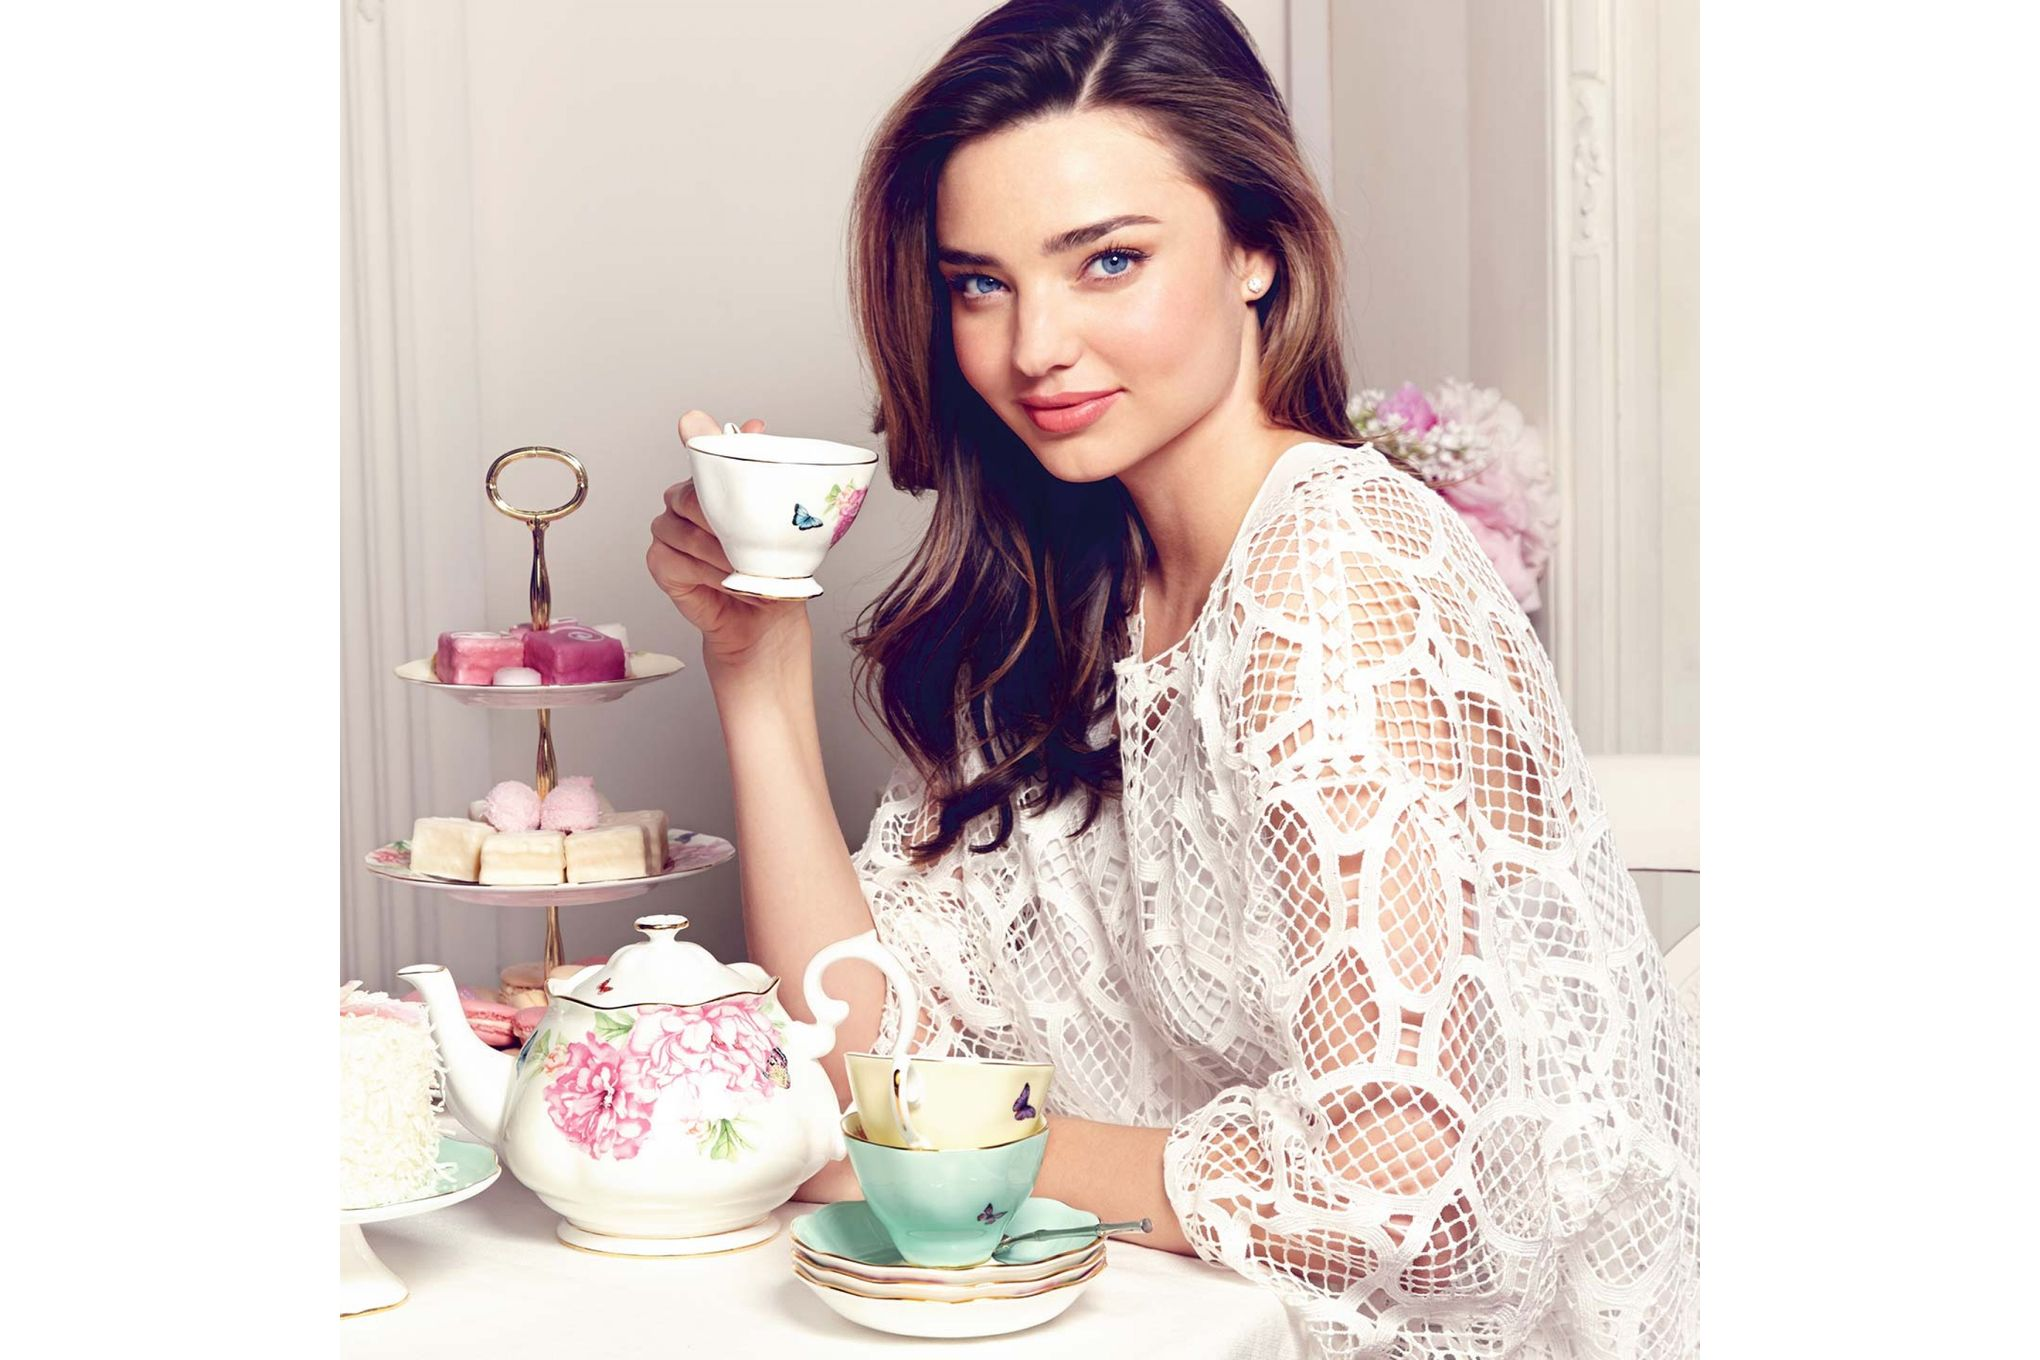 Miranda Kerr for Royal Albert Friendship 3 Piece Tea set Teapot, Sugar and Cream thumb 3